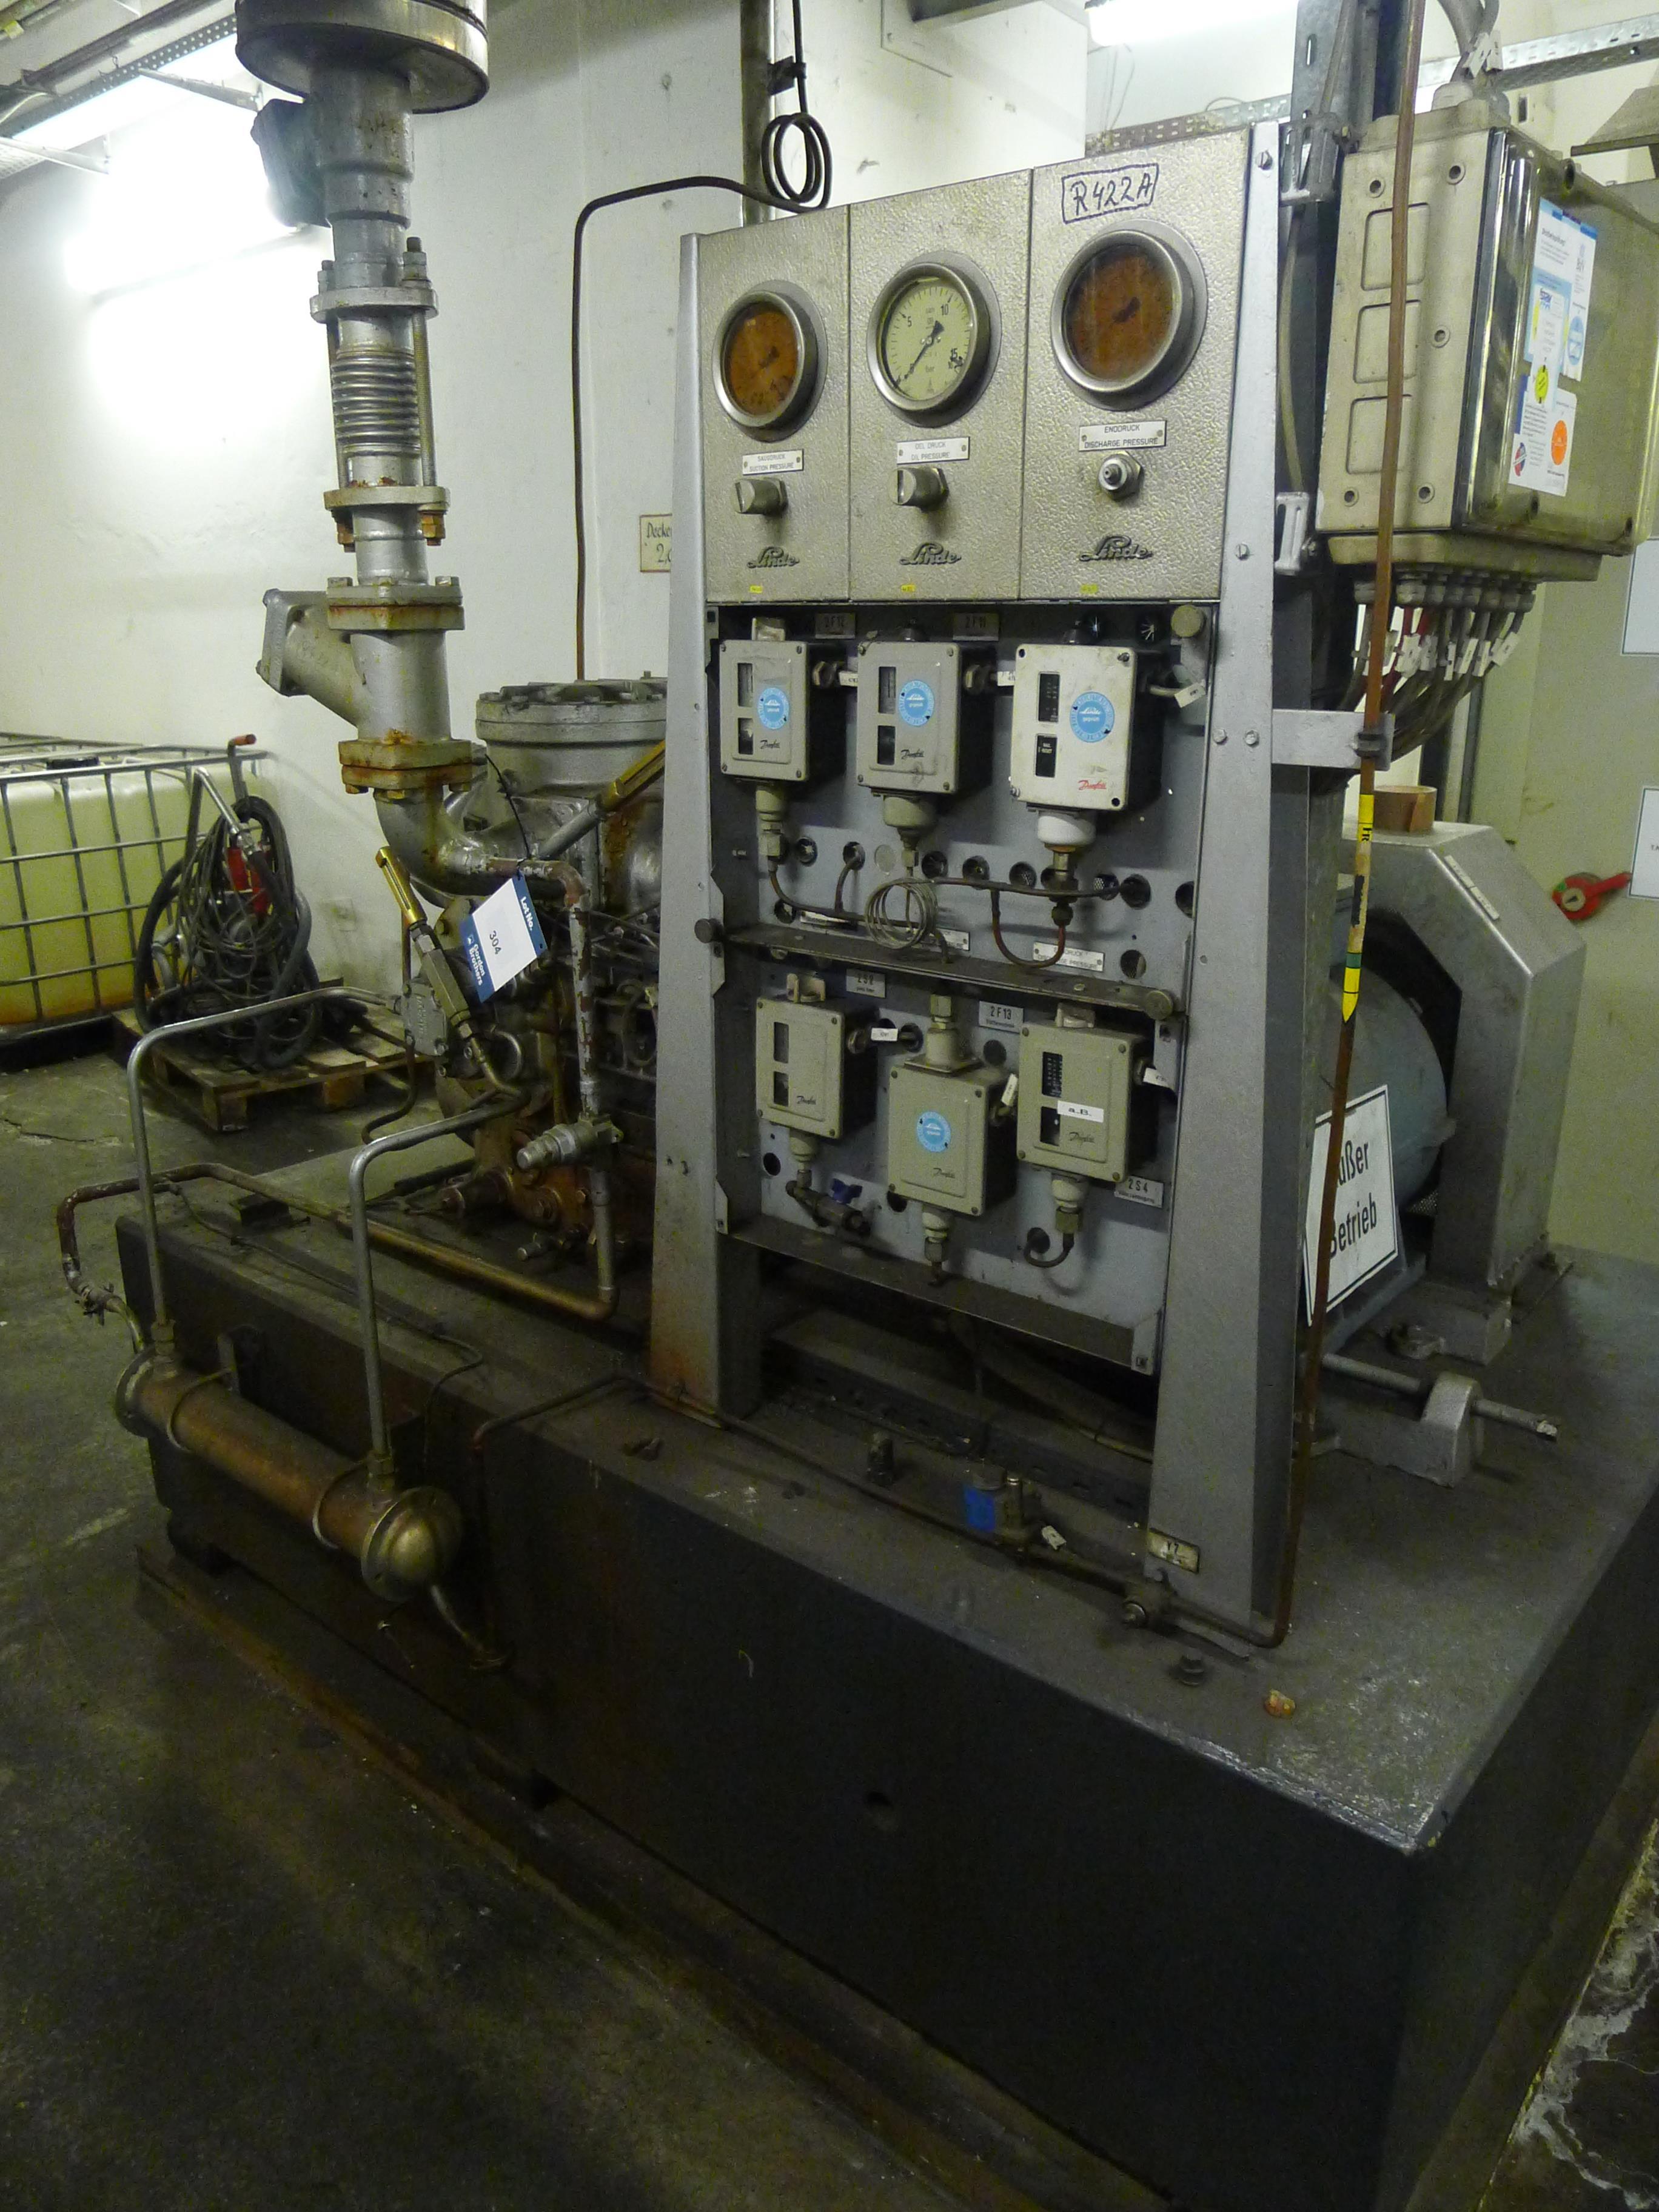 Lot 304 - Linde AAD6270 HKW VERC Cooling Compressor S/N D6305 (Dismantling and Loading Fee: €450)